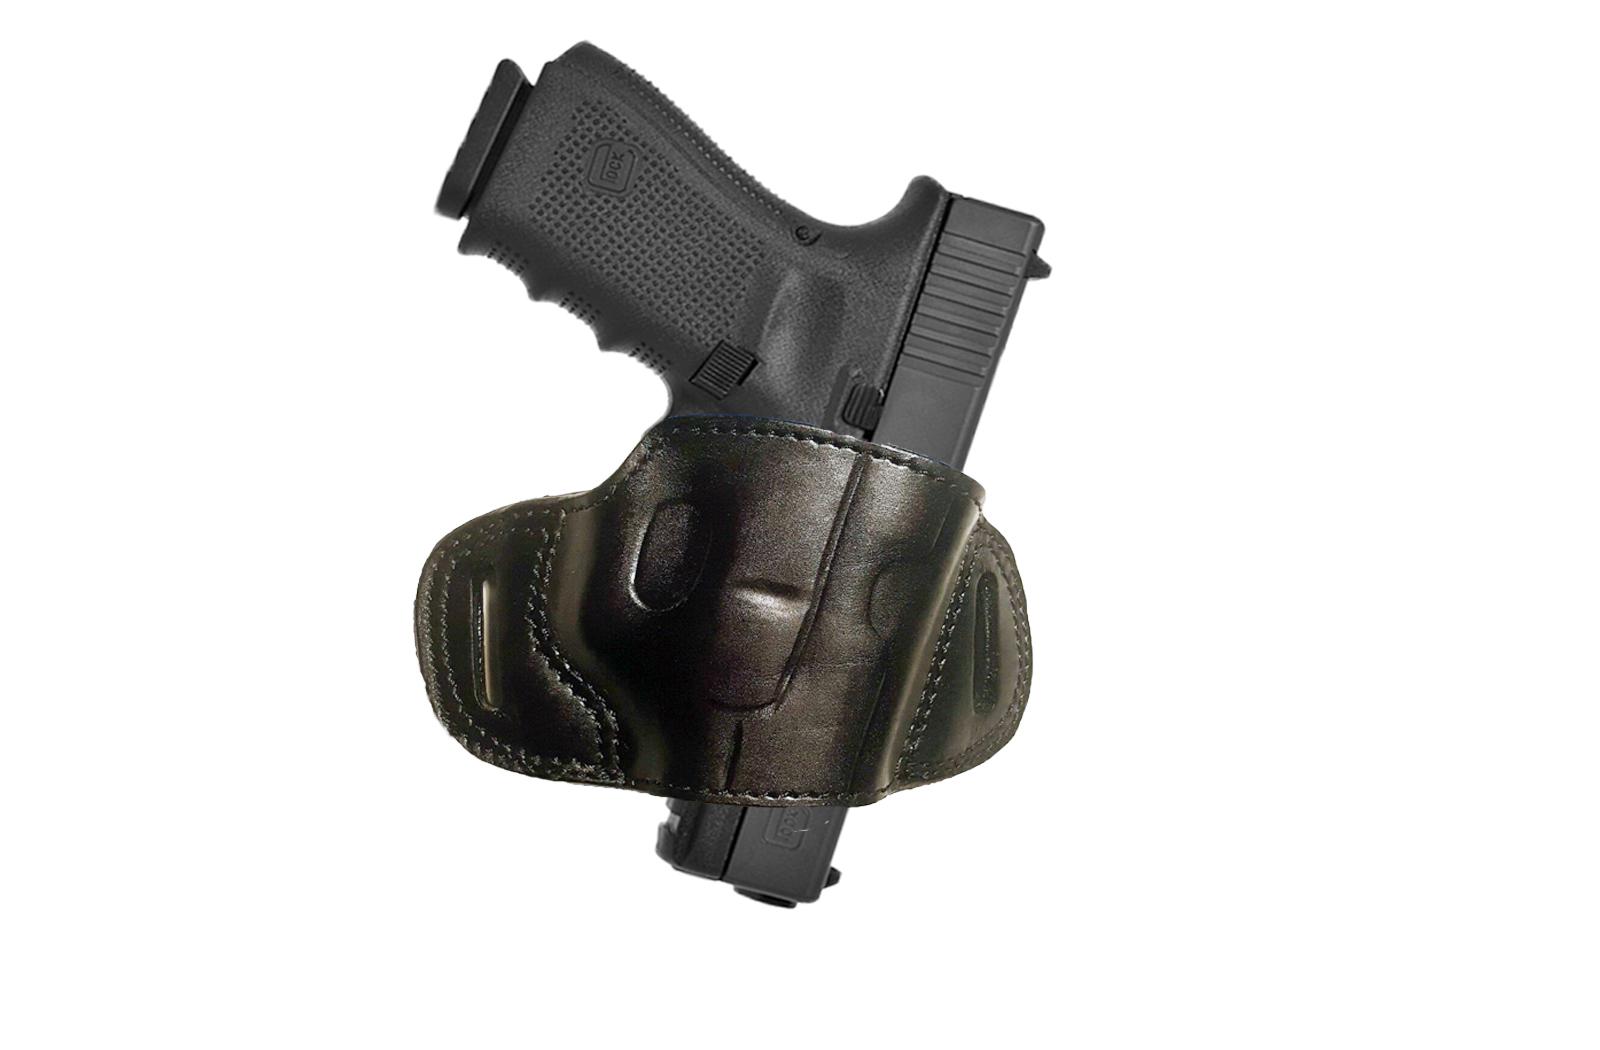 Leather IWB Gun Holster fits Glock 17 19 20 21,22 25 31 33